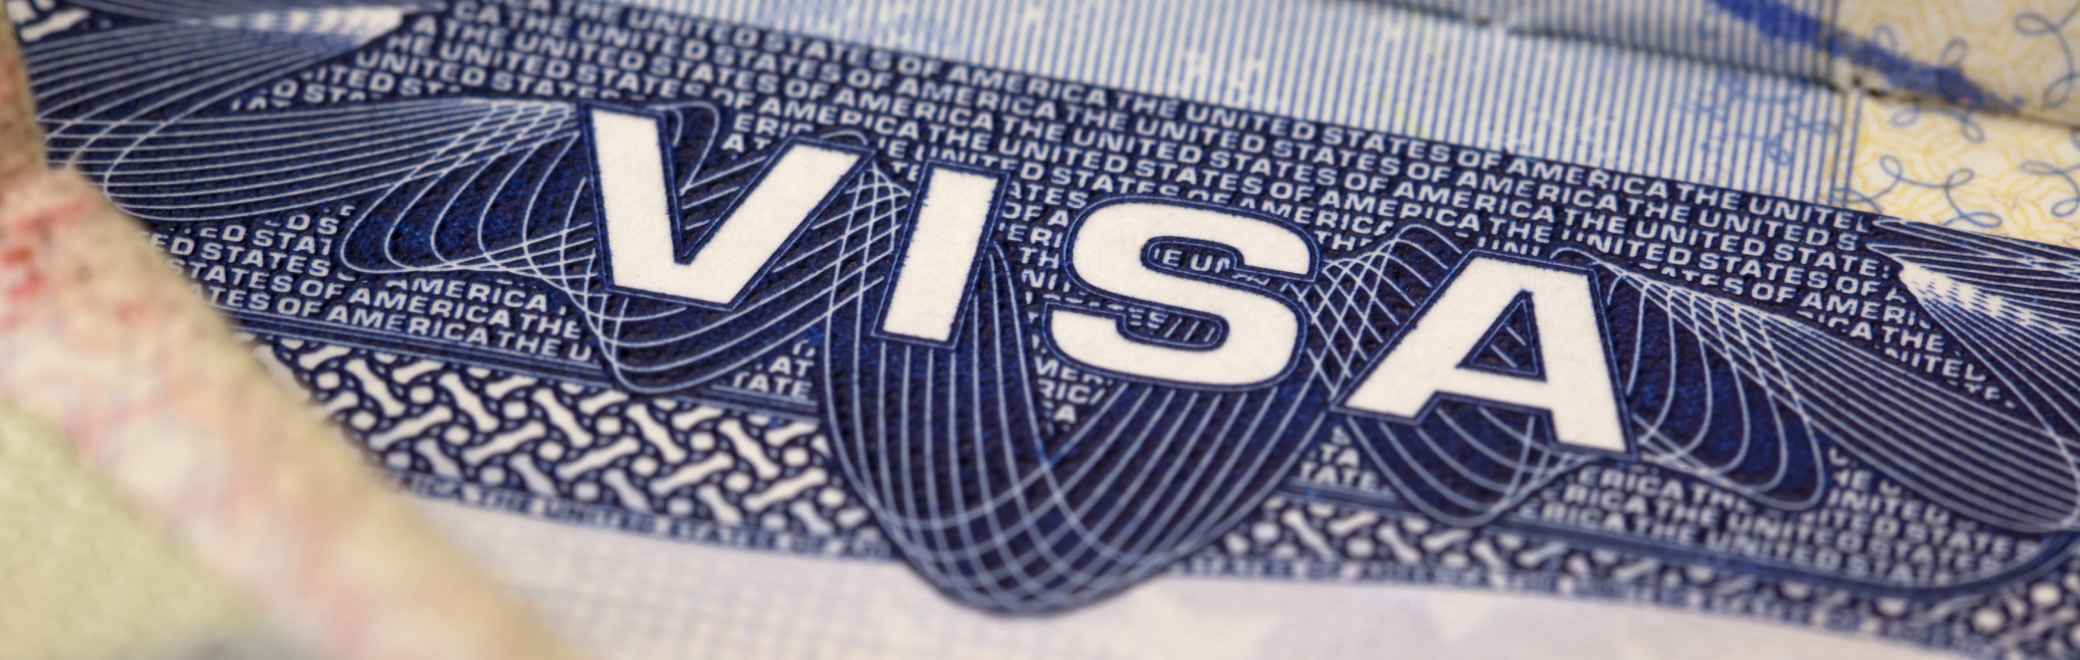 Visa passeport taxe omra Hajj Omra Arabie Saoudite